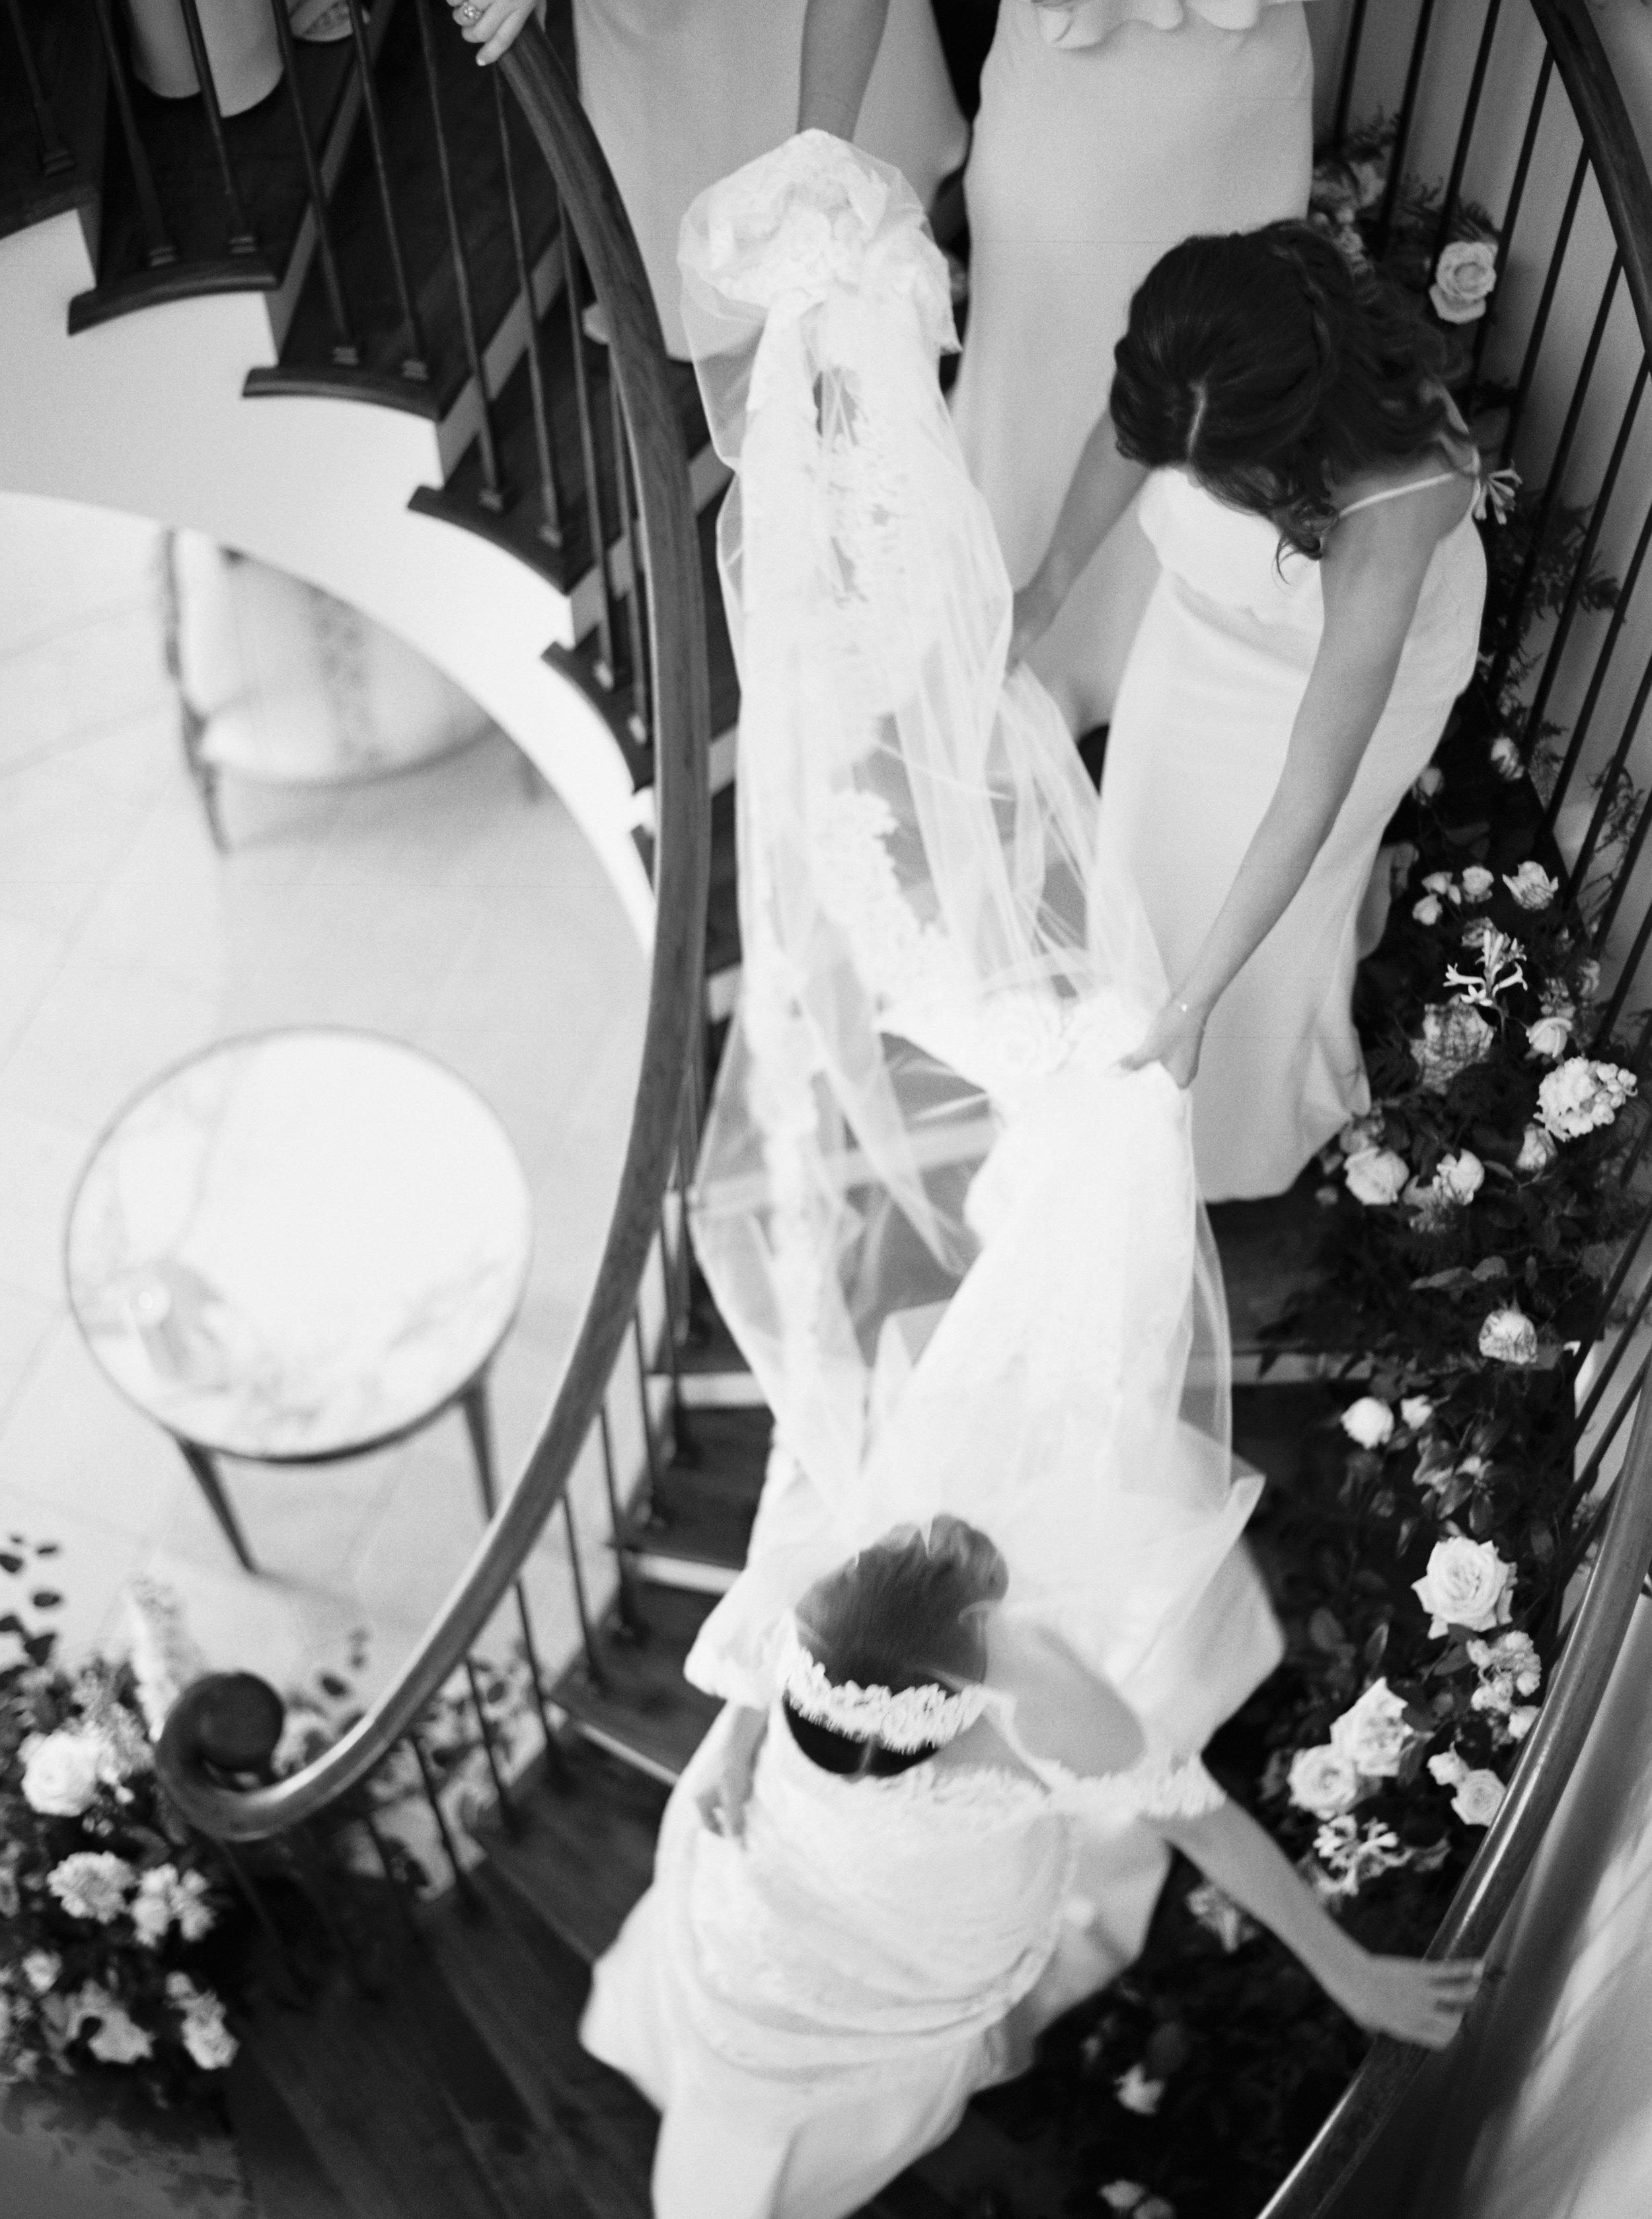 Kyle John l Fine Art Wedding Photography l Chicago, Copenhagen, California, New York, Destination l Blog l Connie & Connor_Winnetka_5